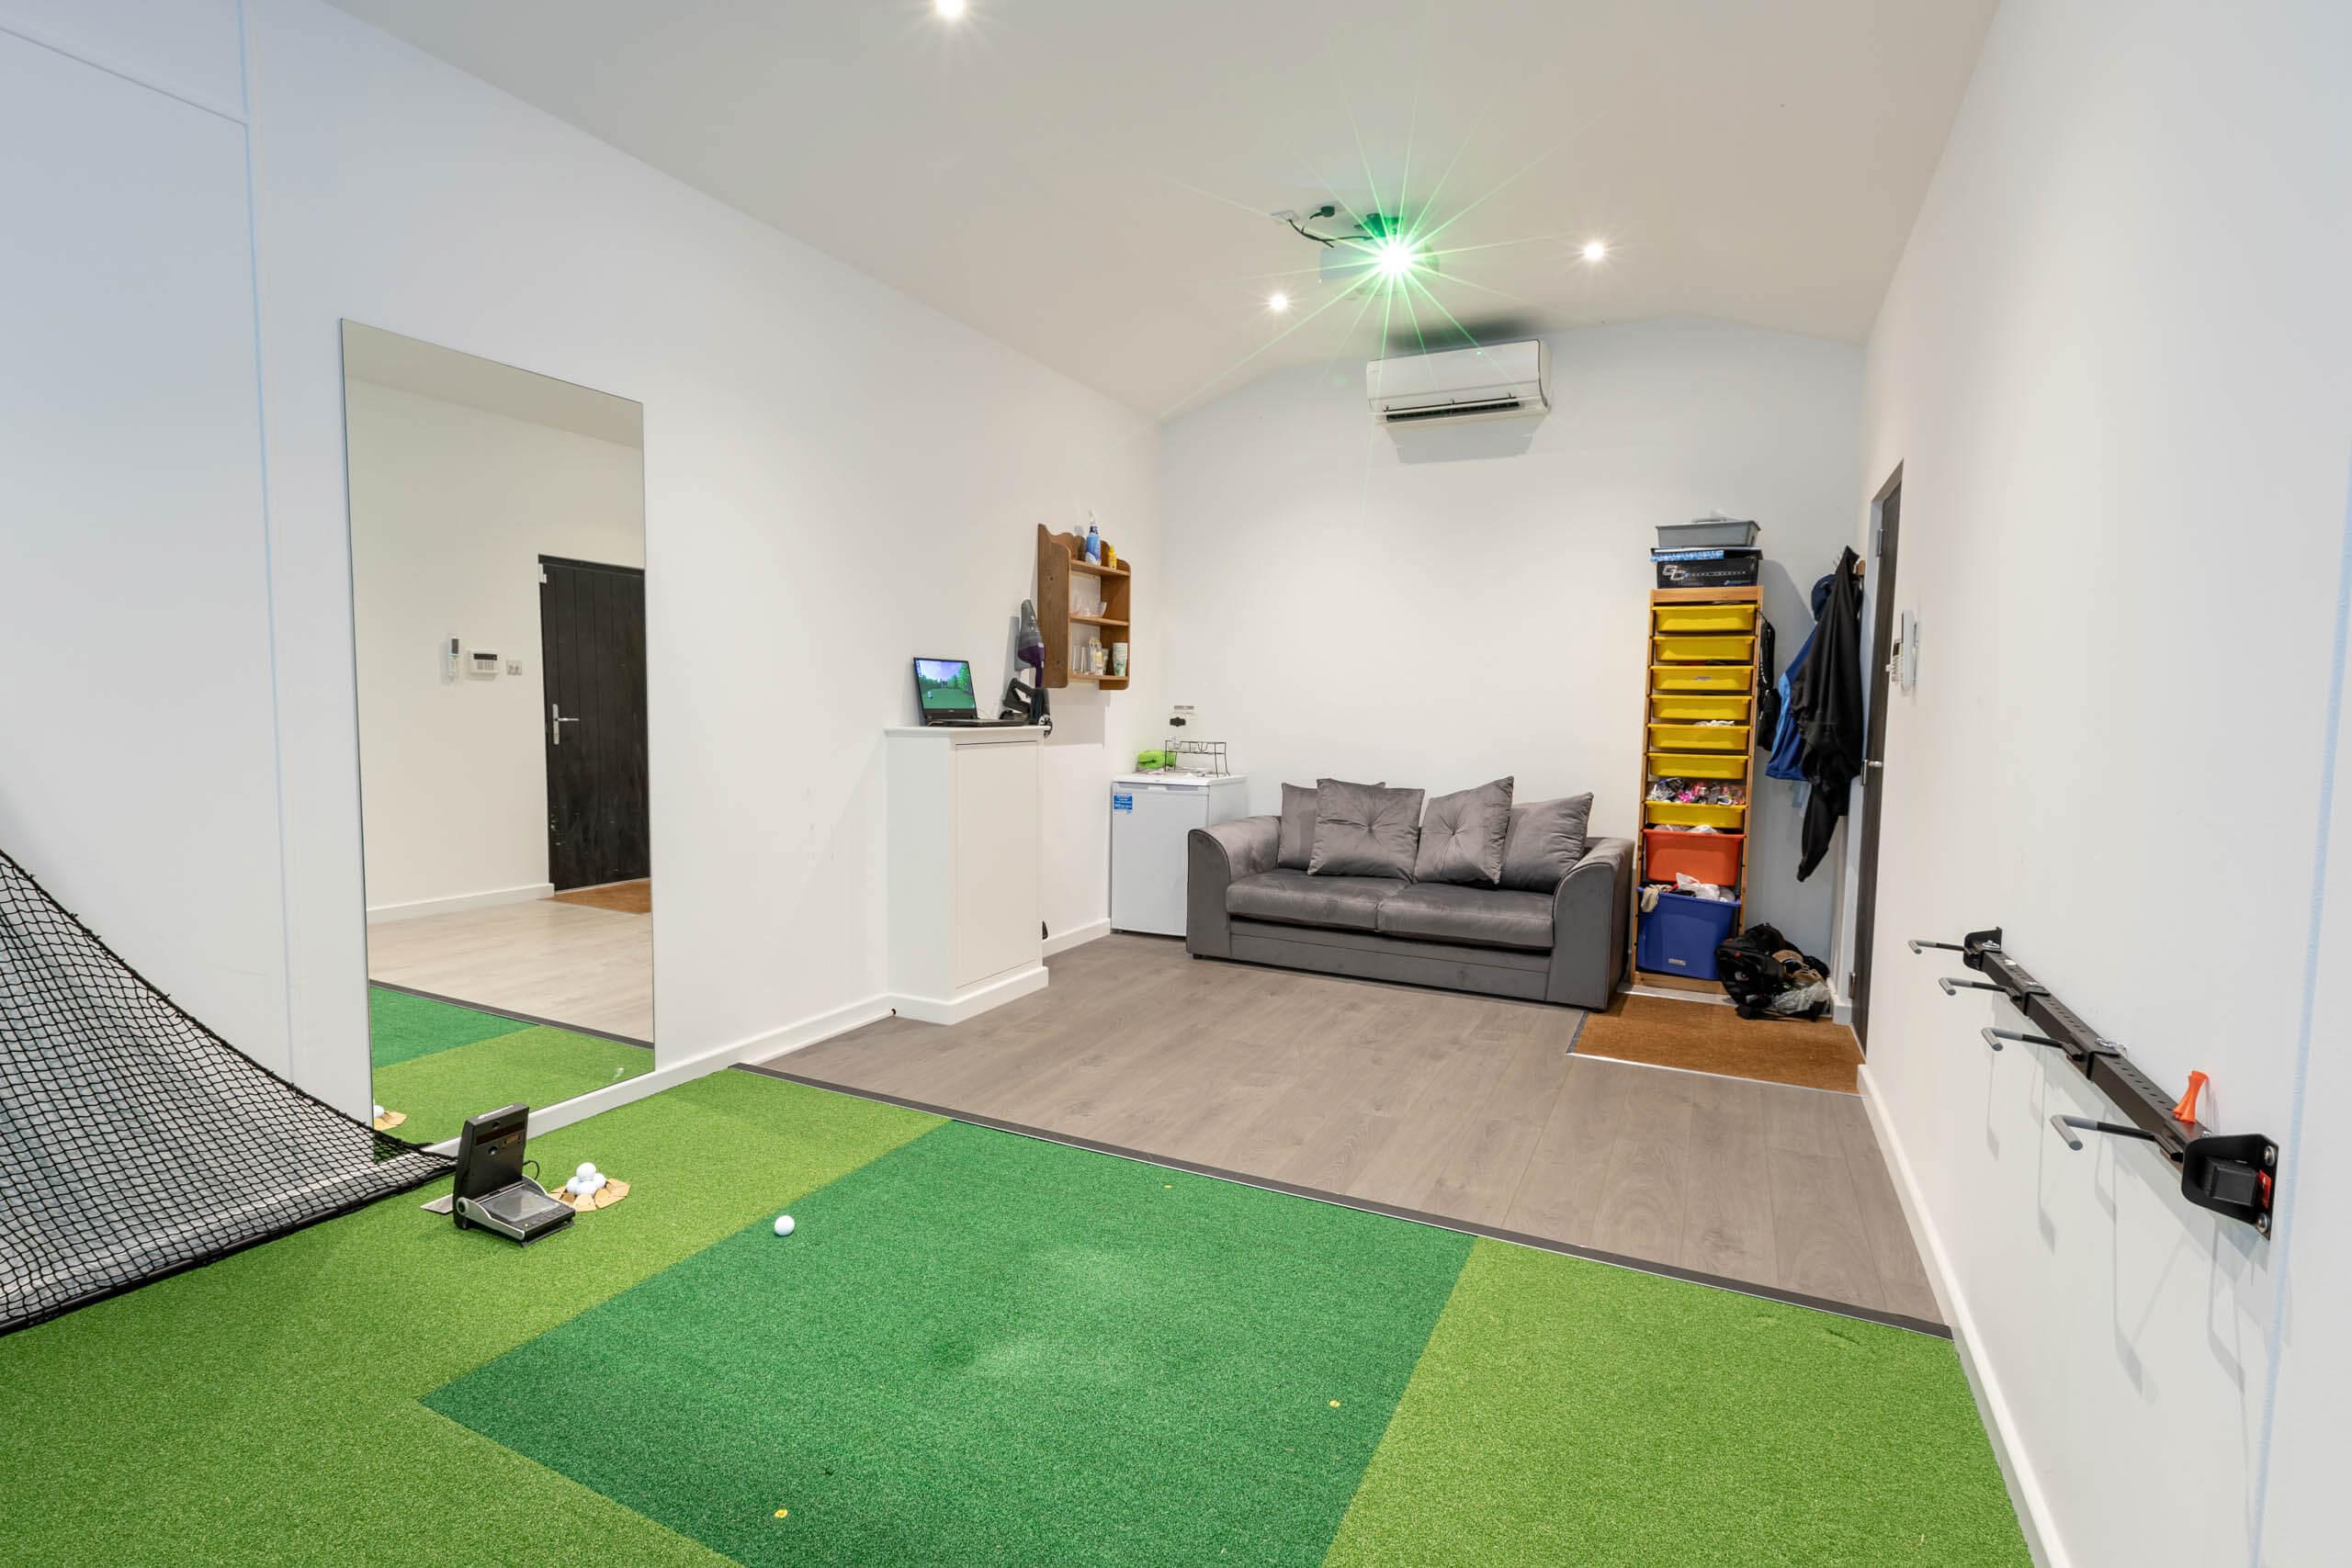 Performance Series Golf Simulator Room Angle 2